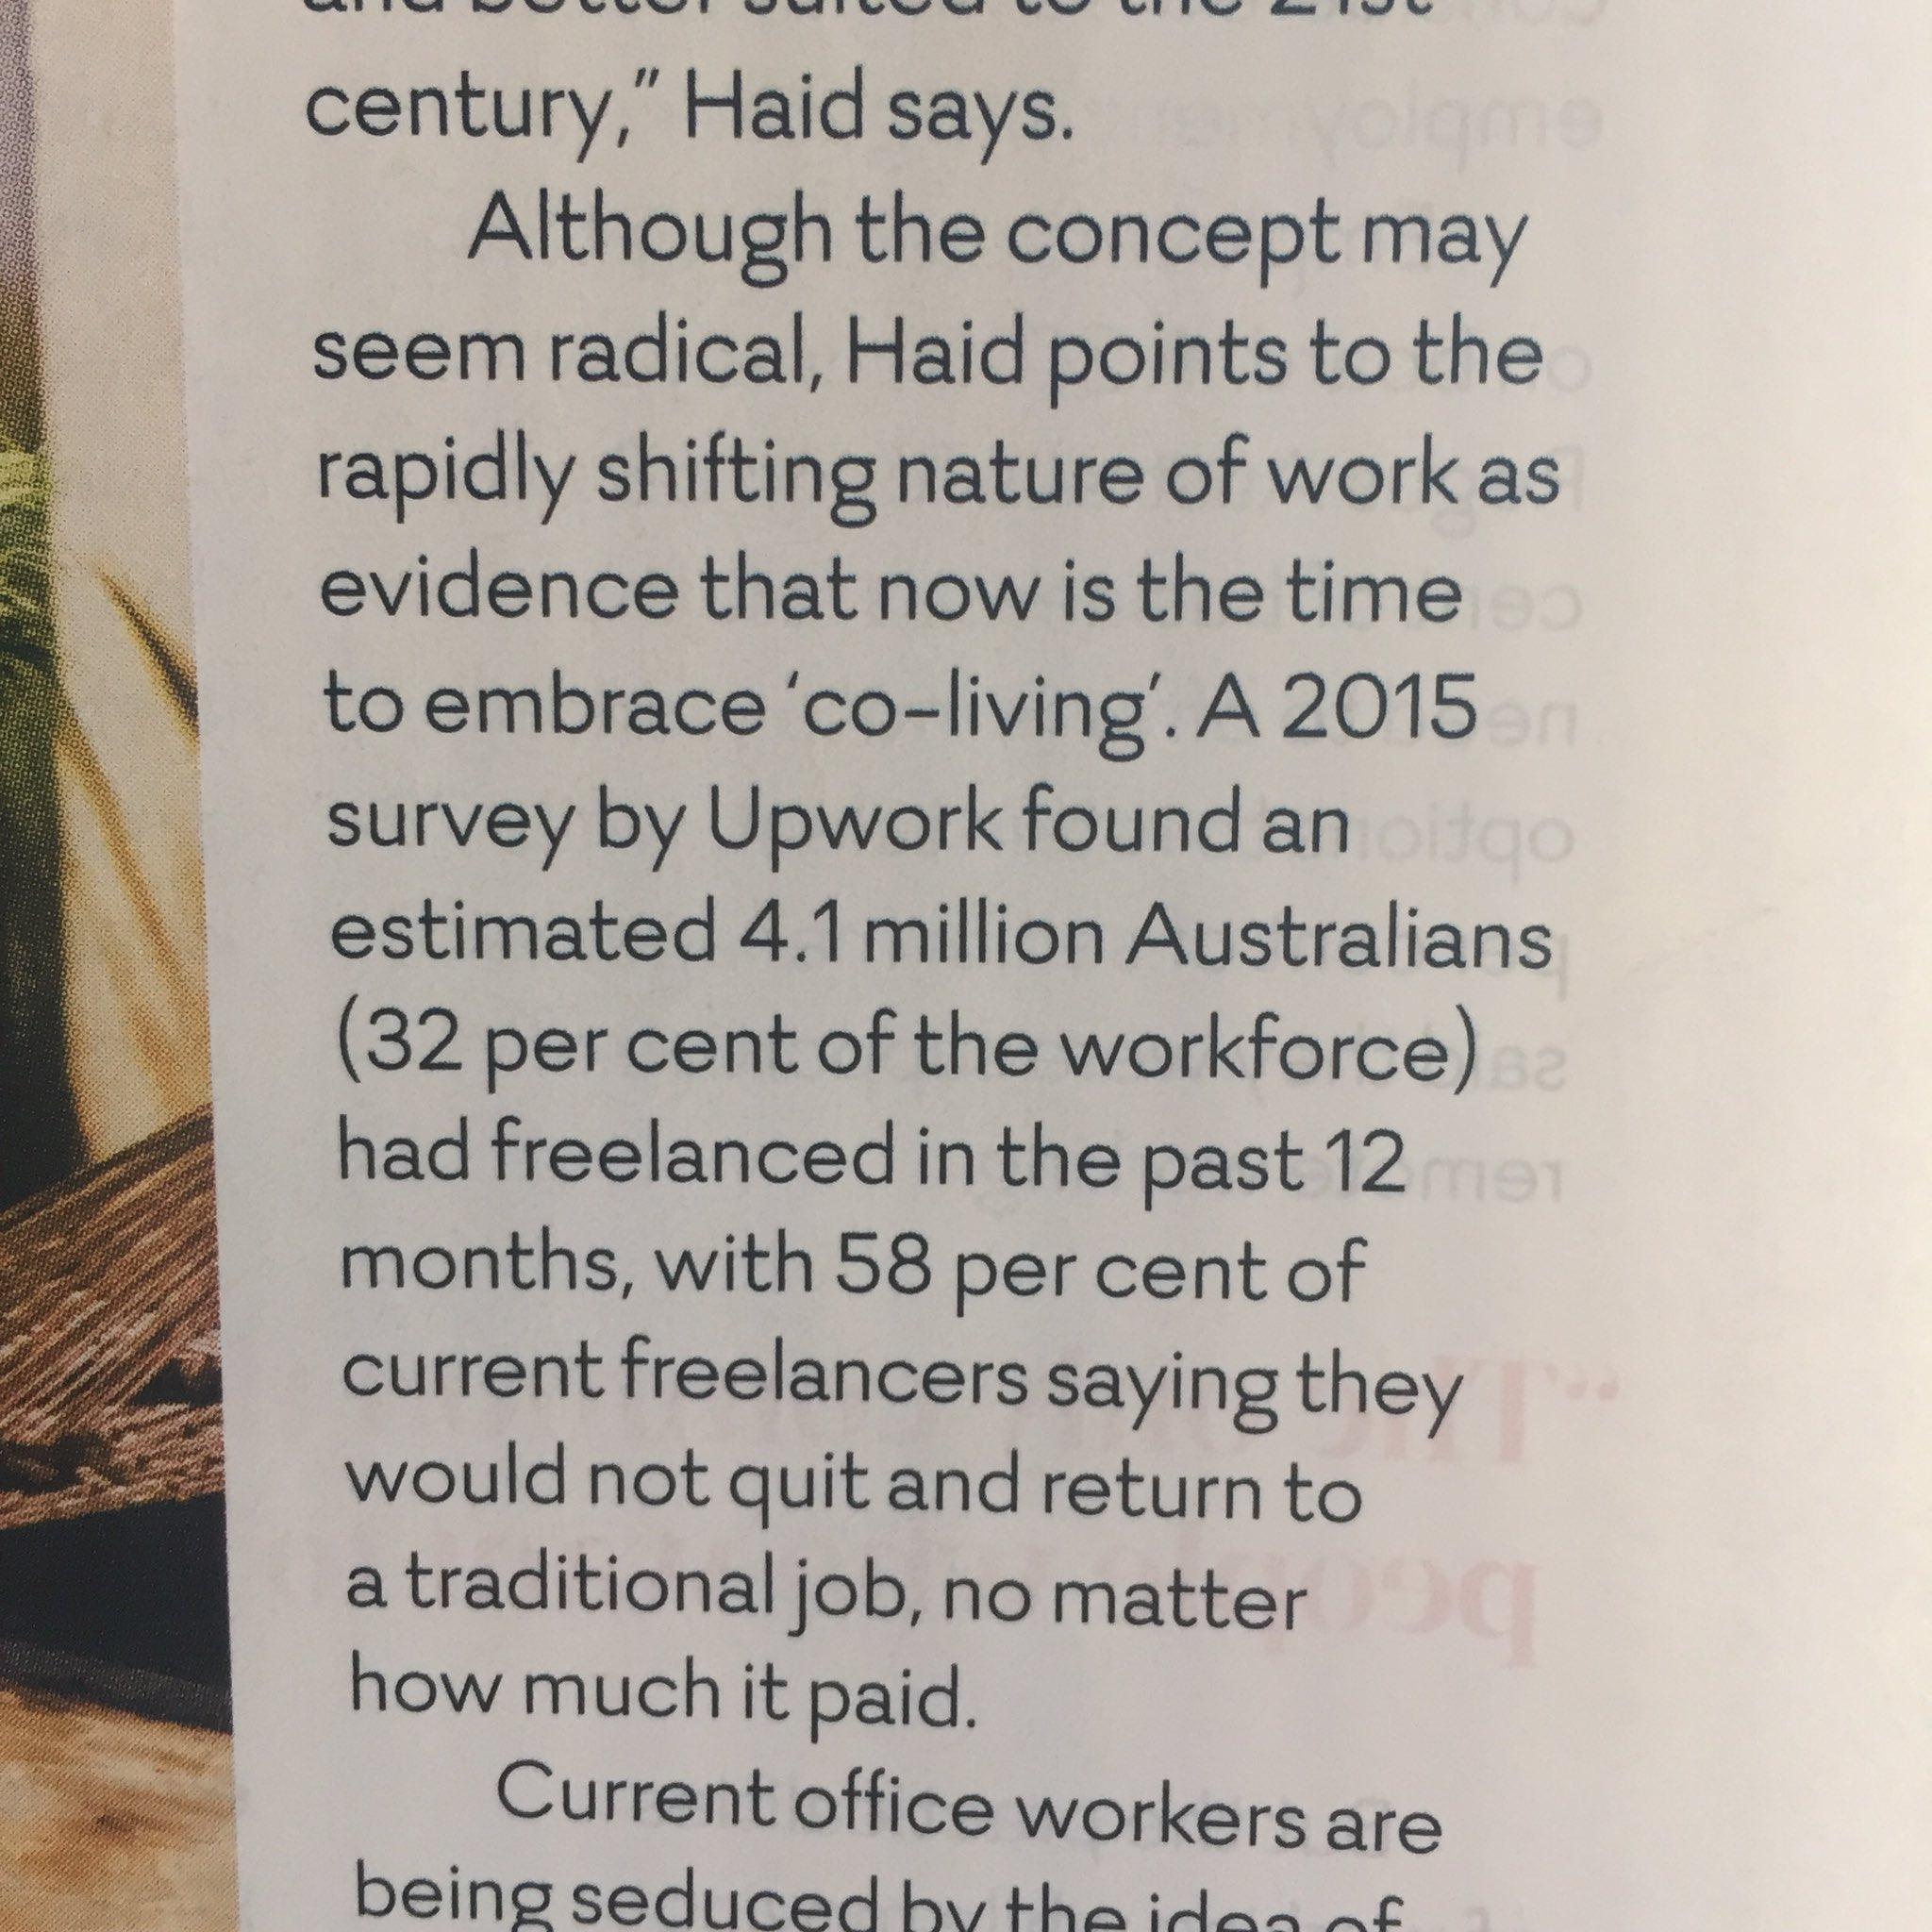 Interesting Upwork survey results in article from Virgin Australia in flight mag. https://t.co/AVVrZsl4rw